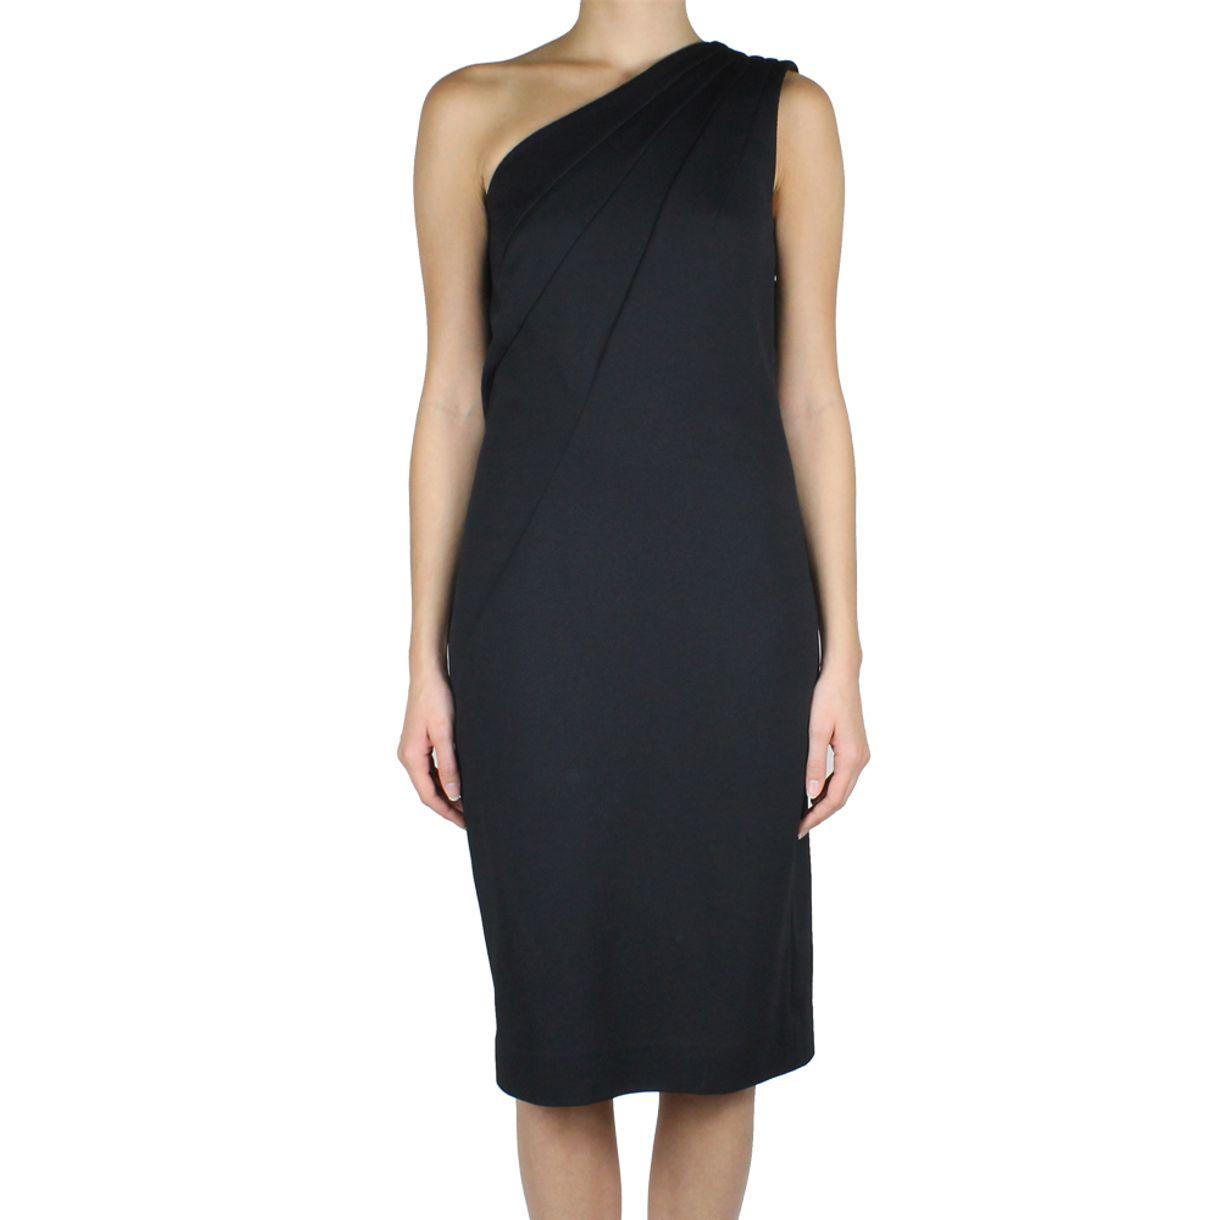 vestido-diane-von-furstenberg-assimetrico-preto